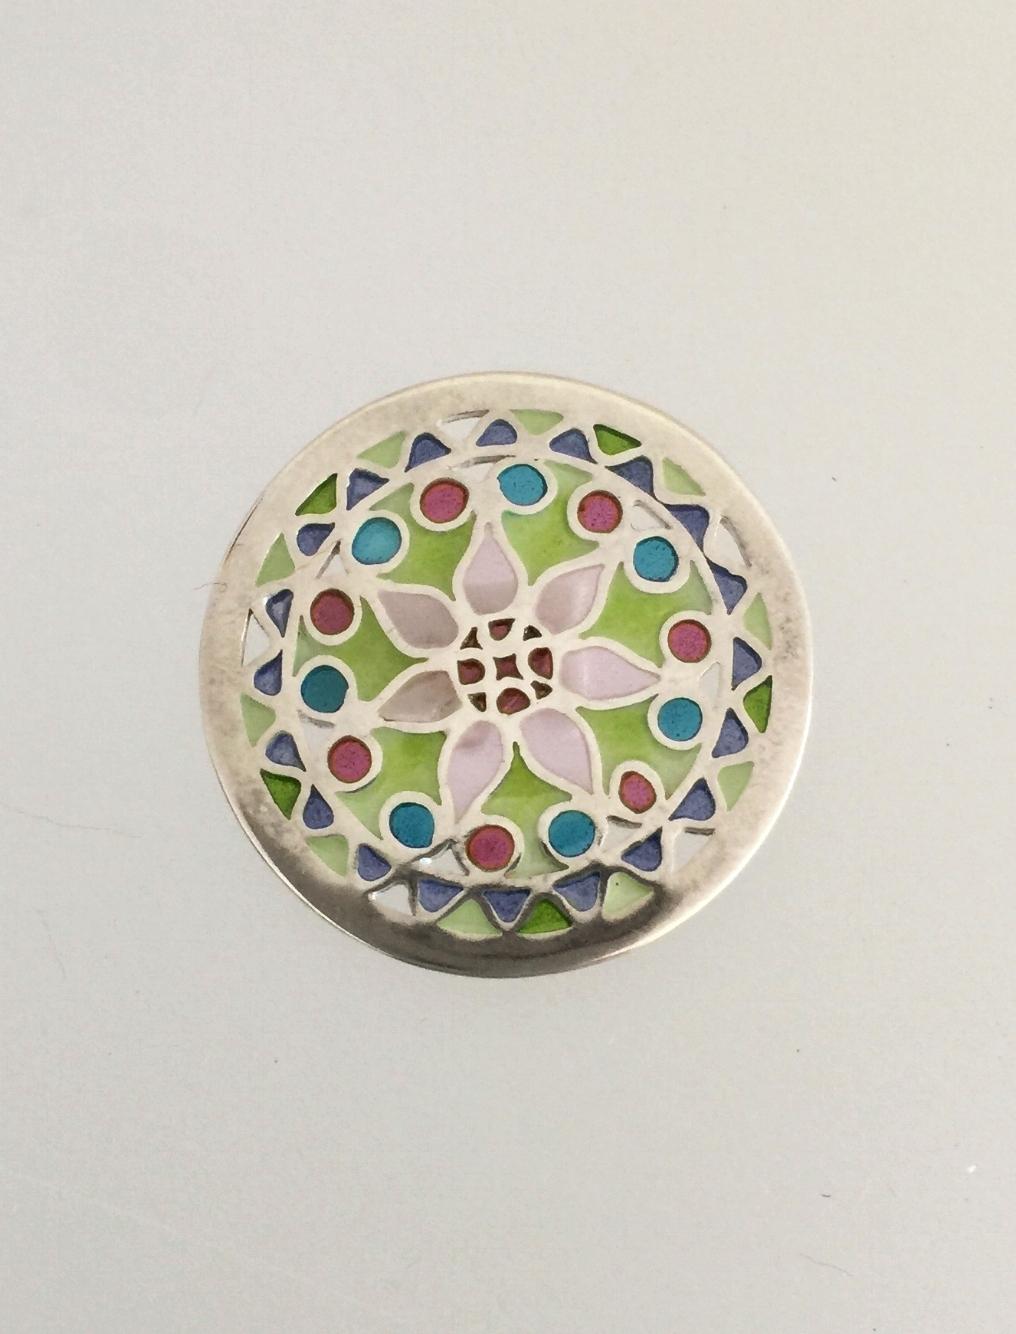 Kari's Button